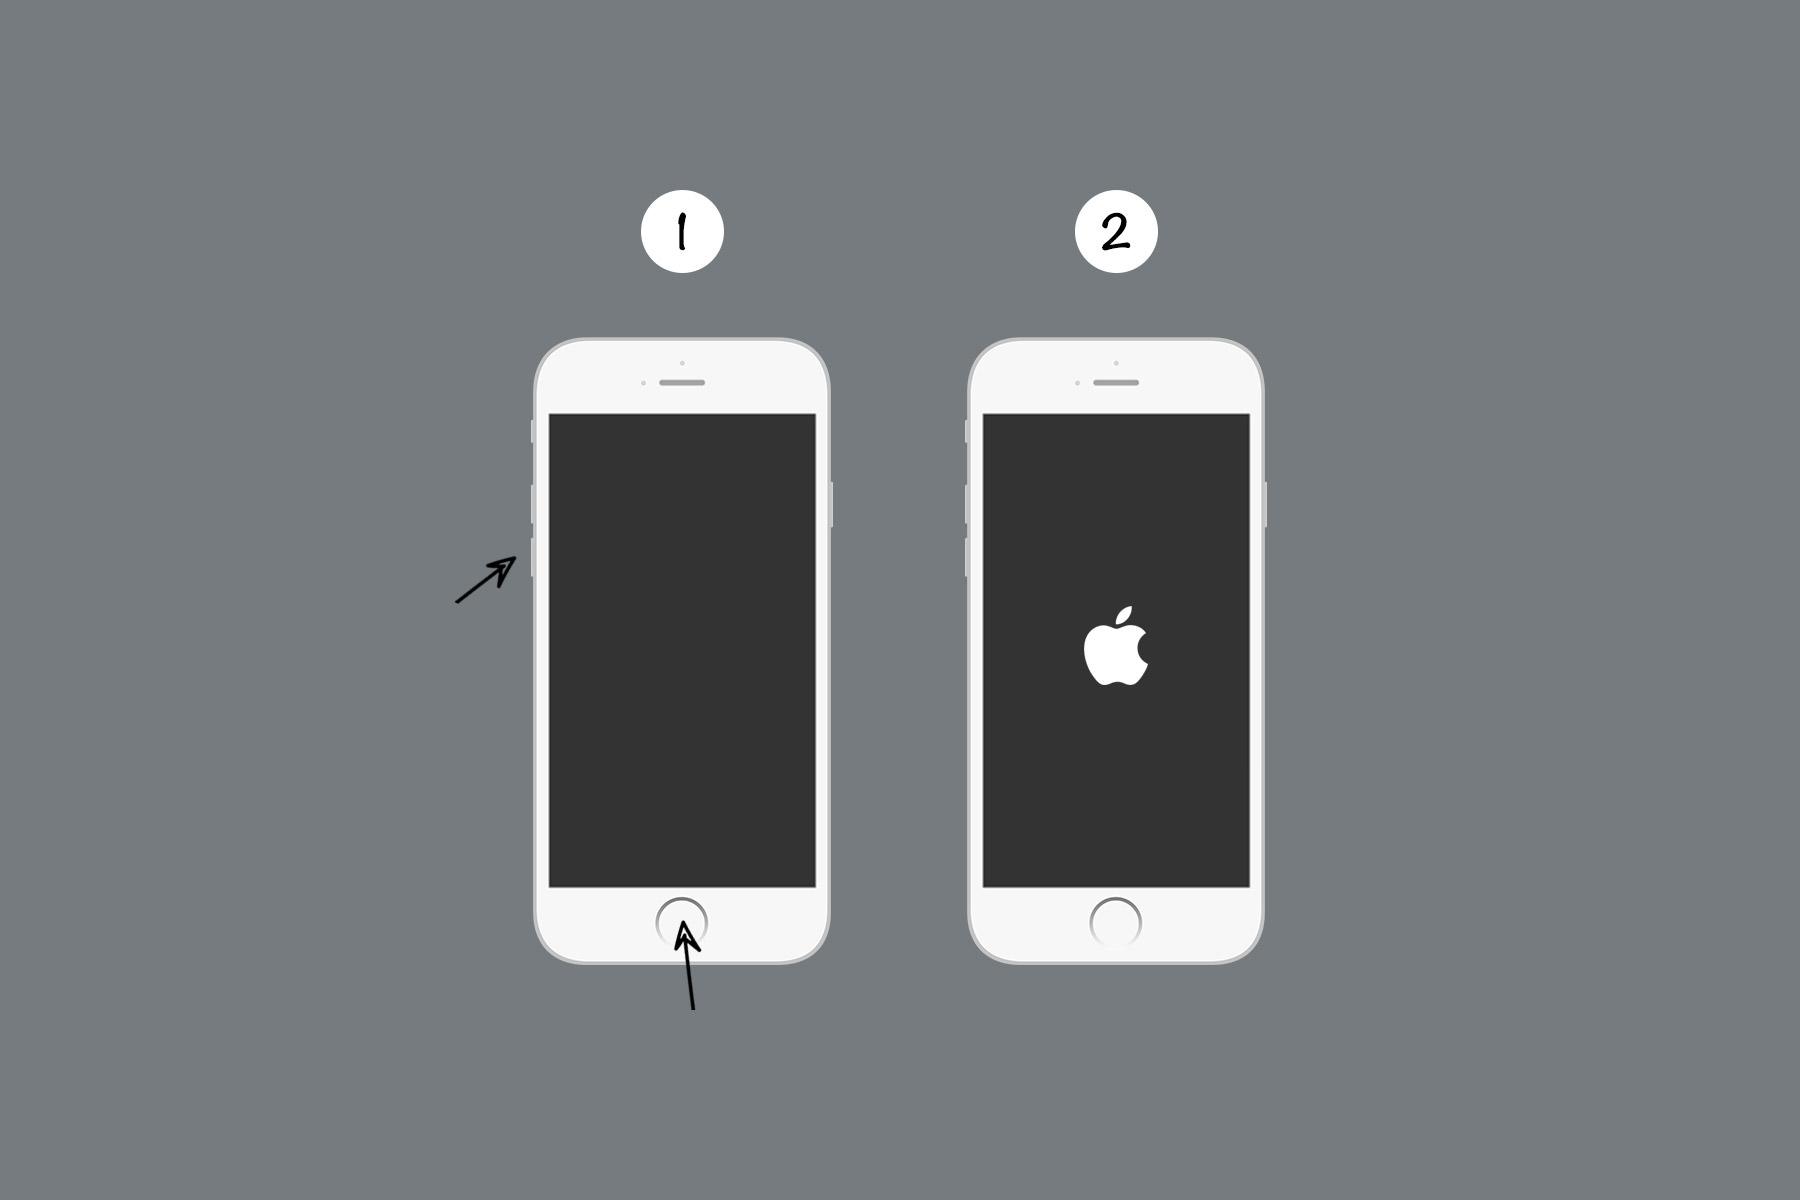 Setelah-itu-layar-iPhone-akan-berwarna-hitam-sementara-waktu.-Kalau-sudah-seperti-ini-Anda-harus-melepas-tangan-dari-kedua-tombol-home-and-sleep